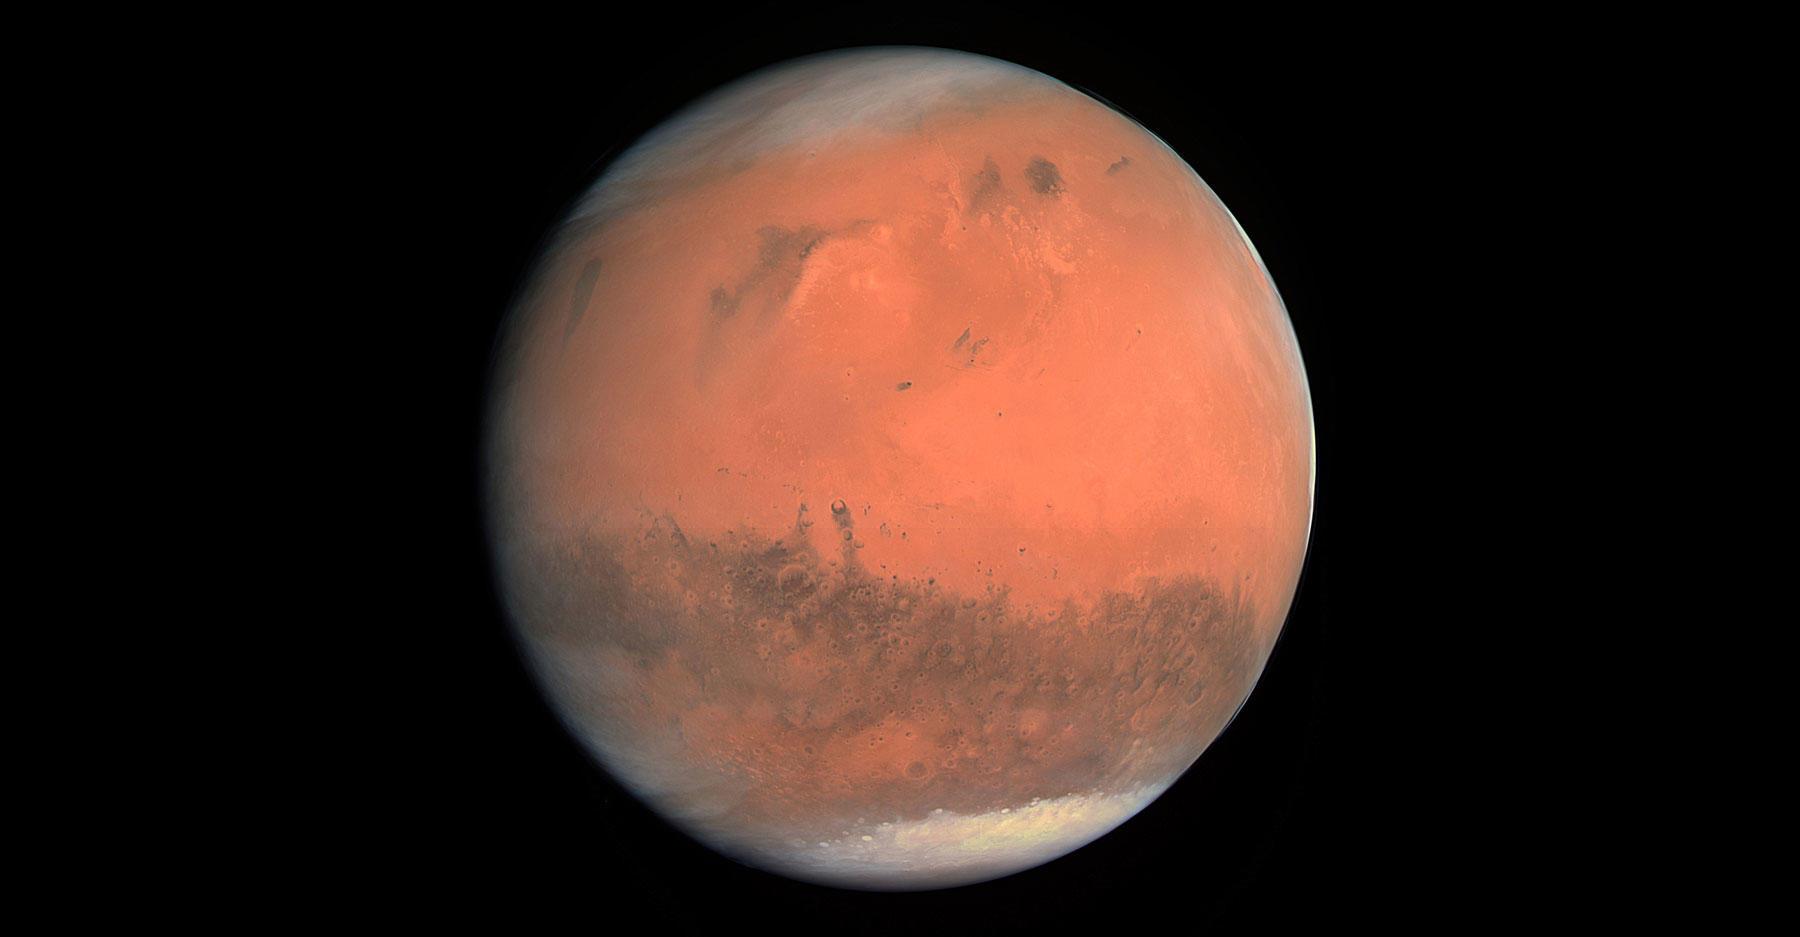 TRUE-COLOUR IMAGE OF MARS SEEN BY OSIRIS